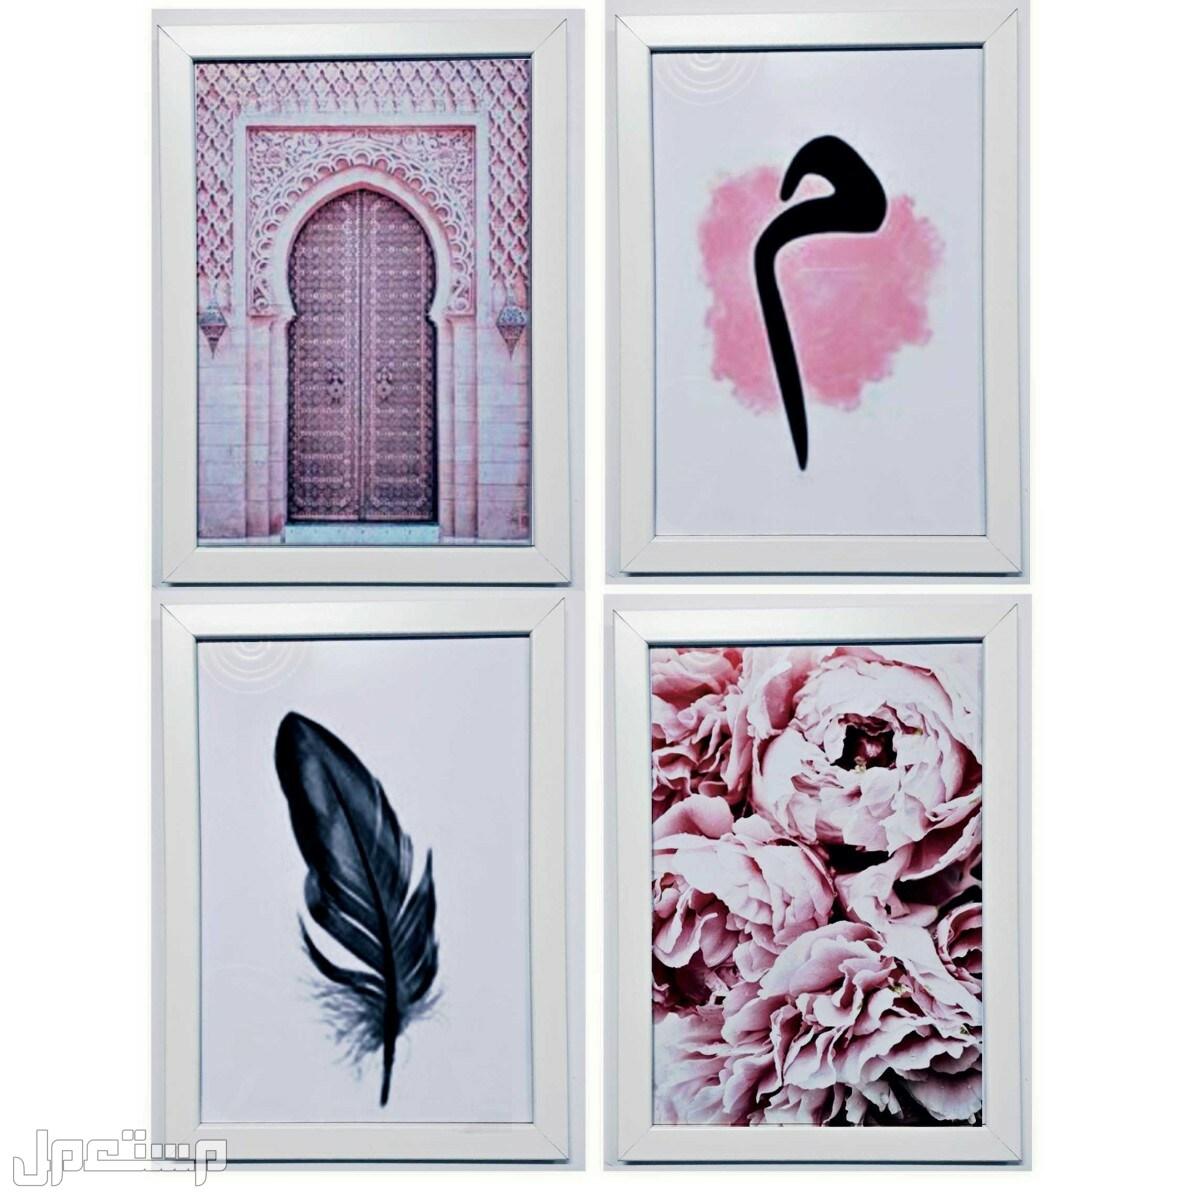 لوحات جدارية 4 لوحات جدارية